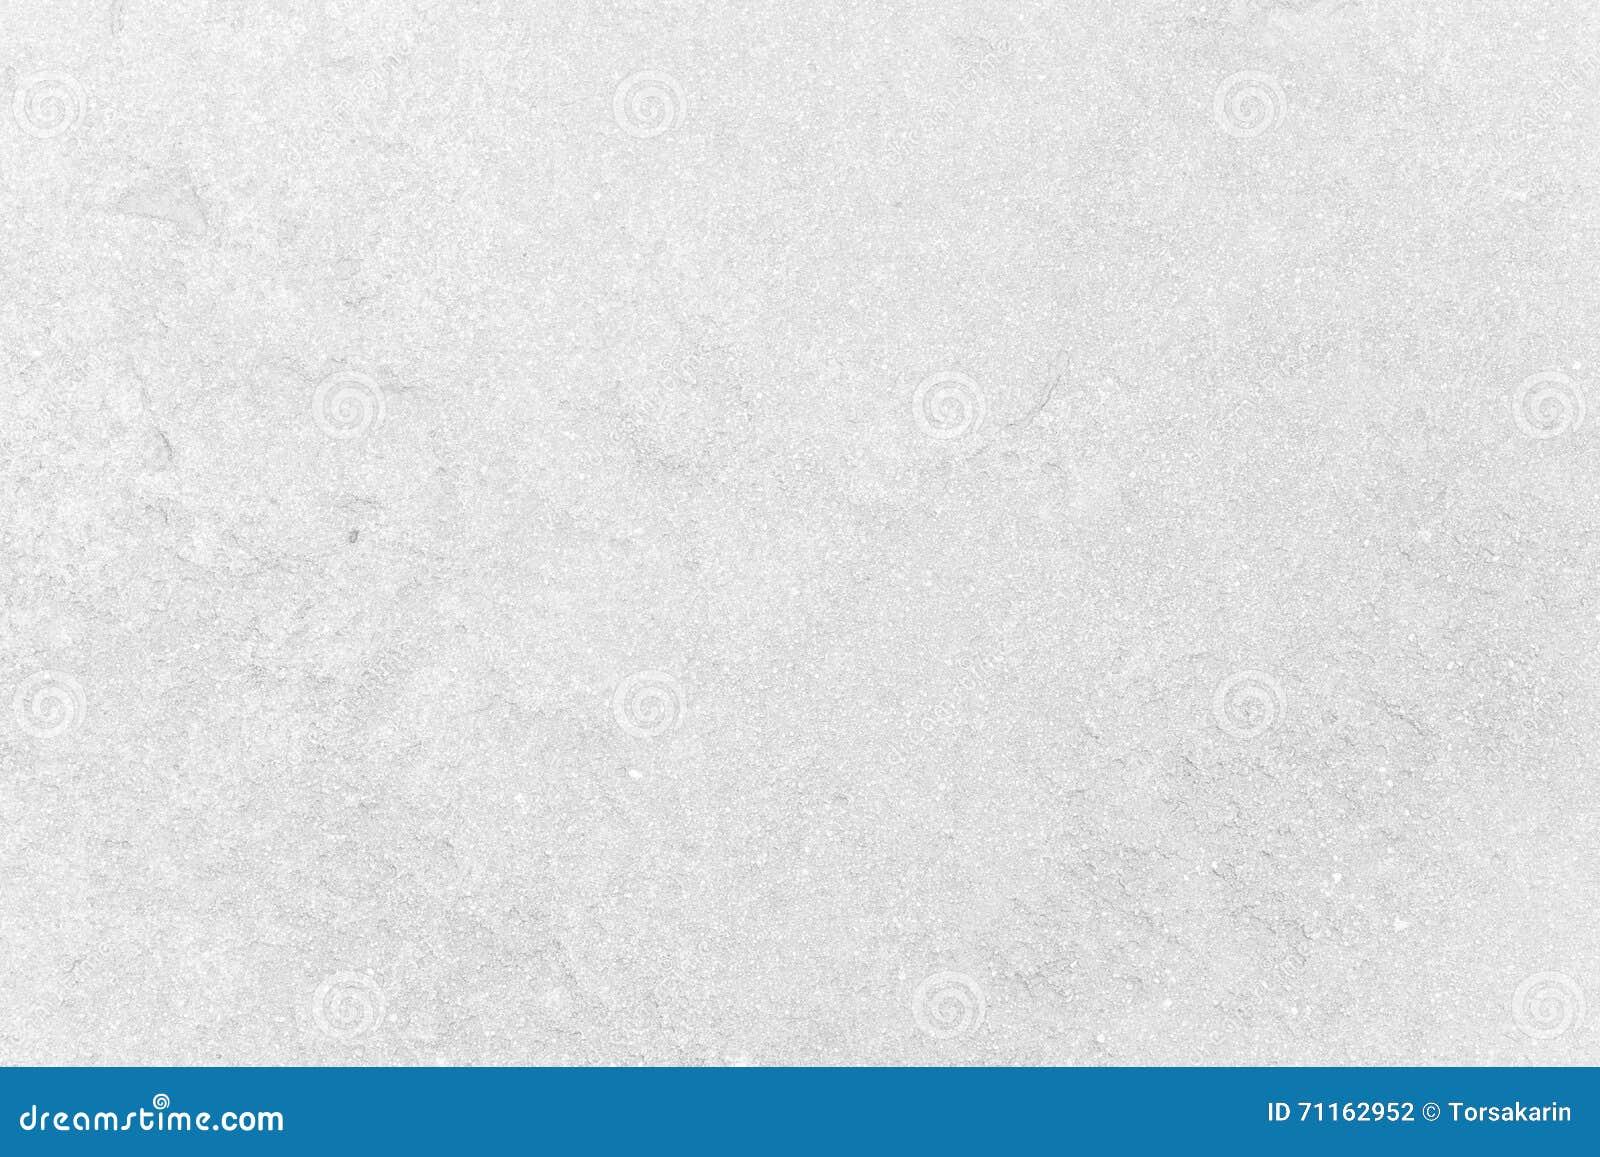 White Natural Stone : White natural sand stone tile wall seamless background